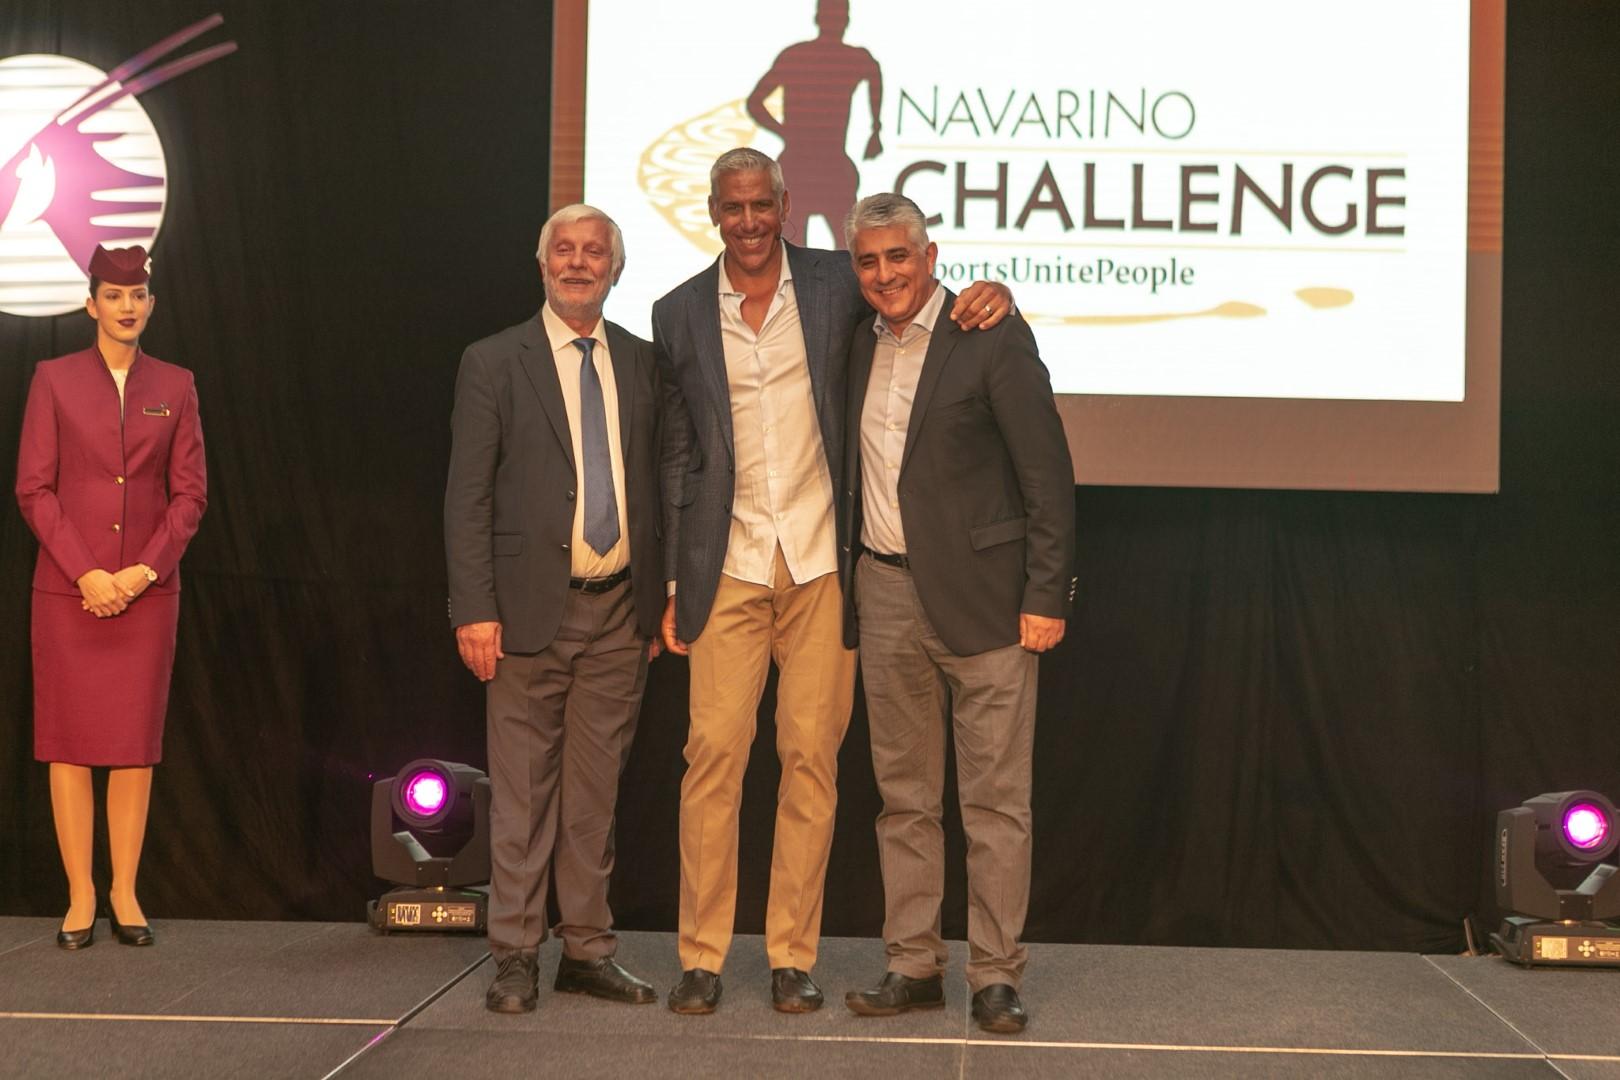 © Navarino Challenge by Vassilis Sfakianopoulos